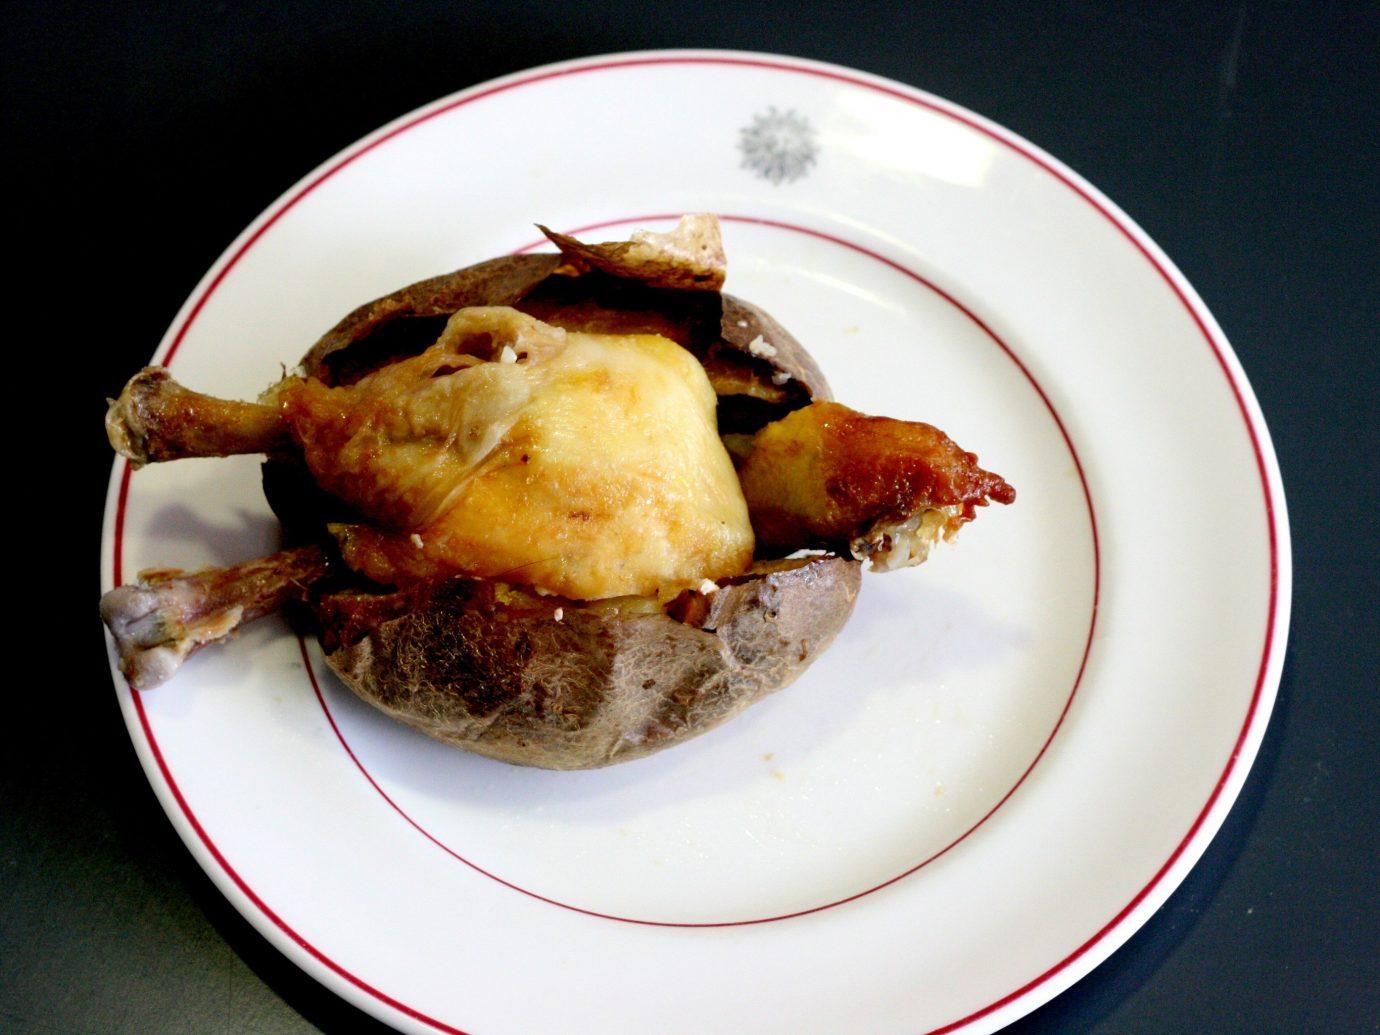 Food + Drink plate food table dish plant dessert produce fruit meal slice breakfast meat cuisine sliced